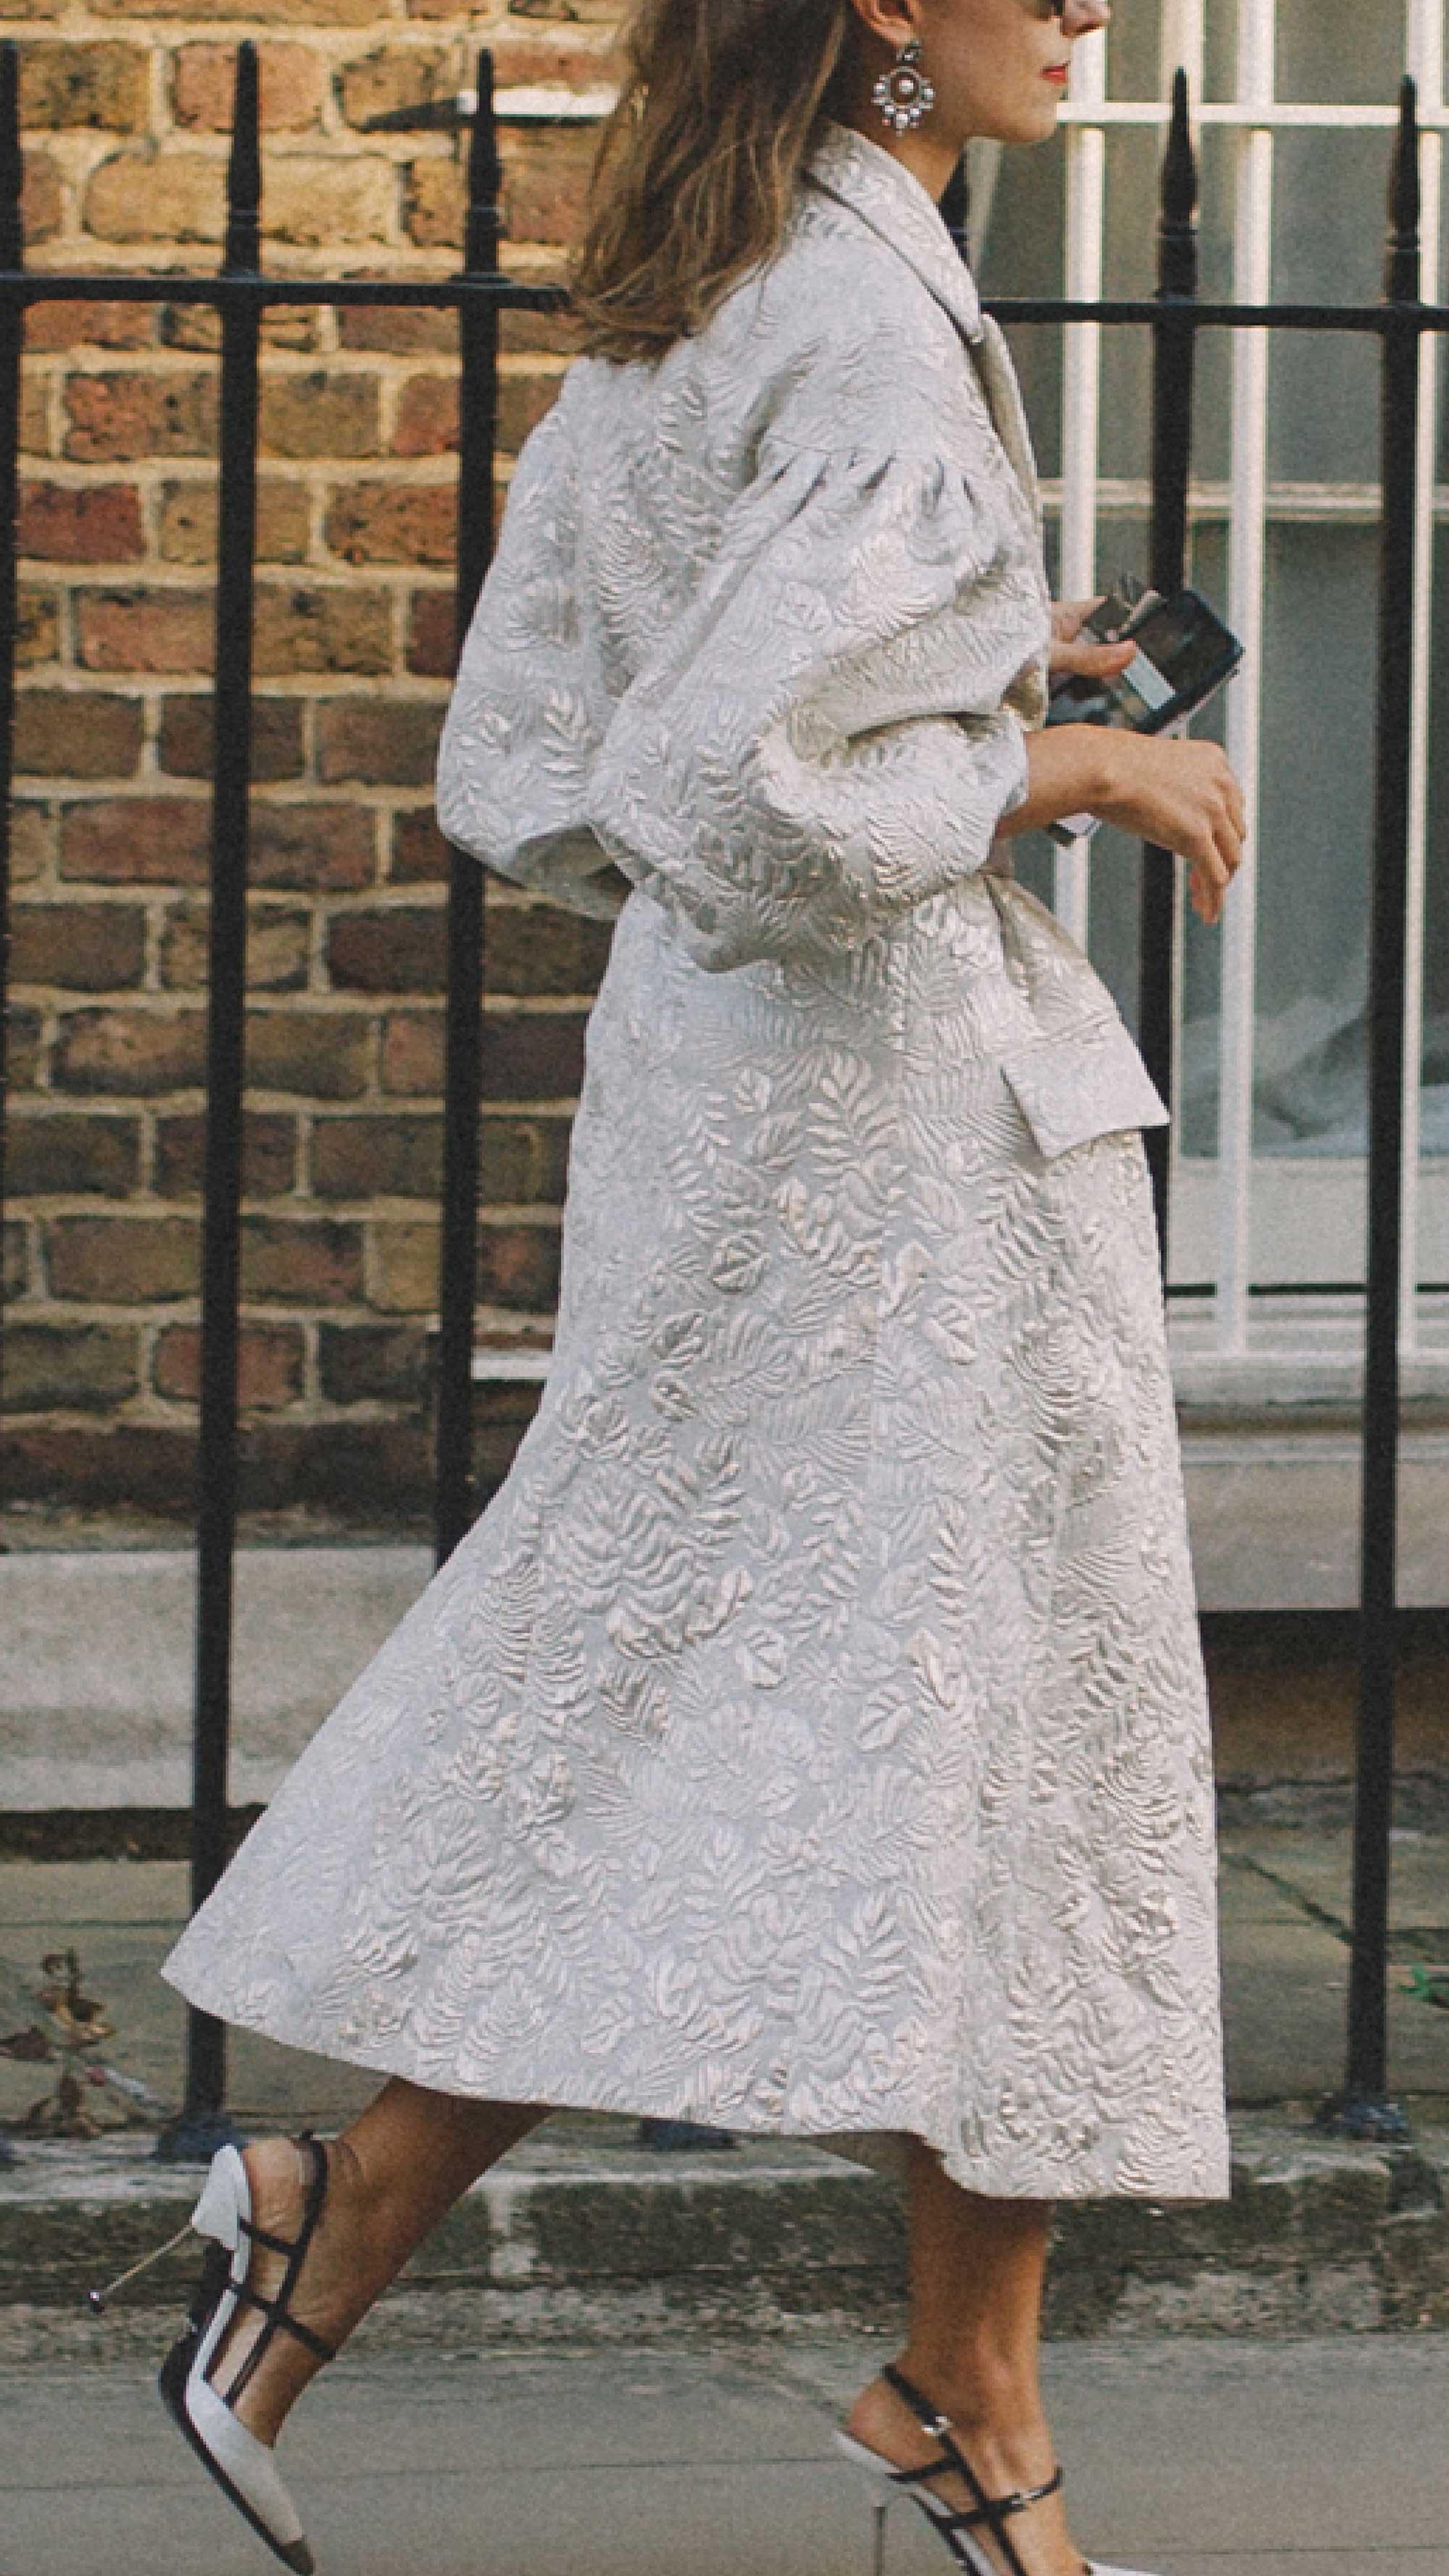 London-fashion-week-street-style-photos-day-two-ss1923.jpg